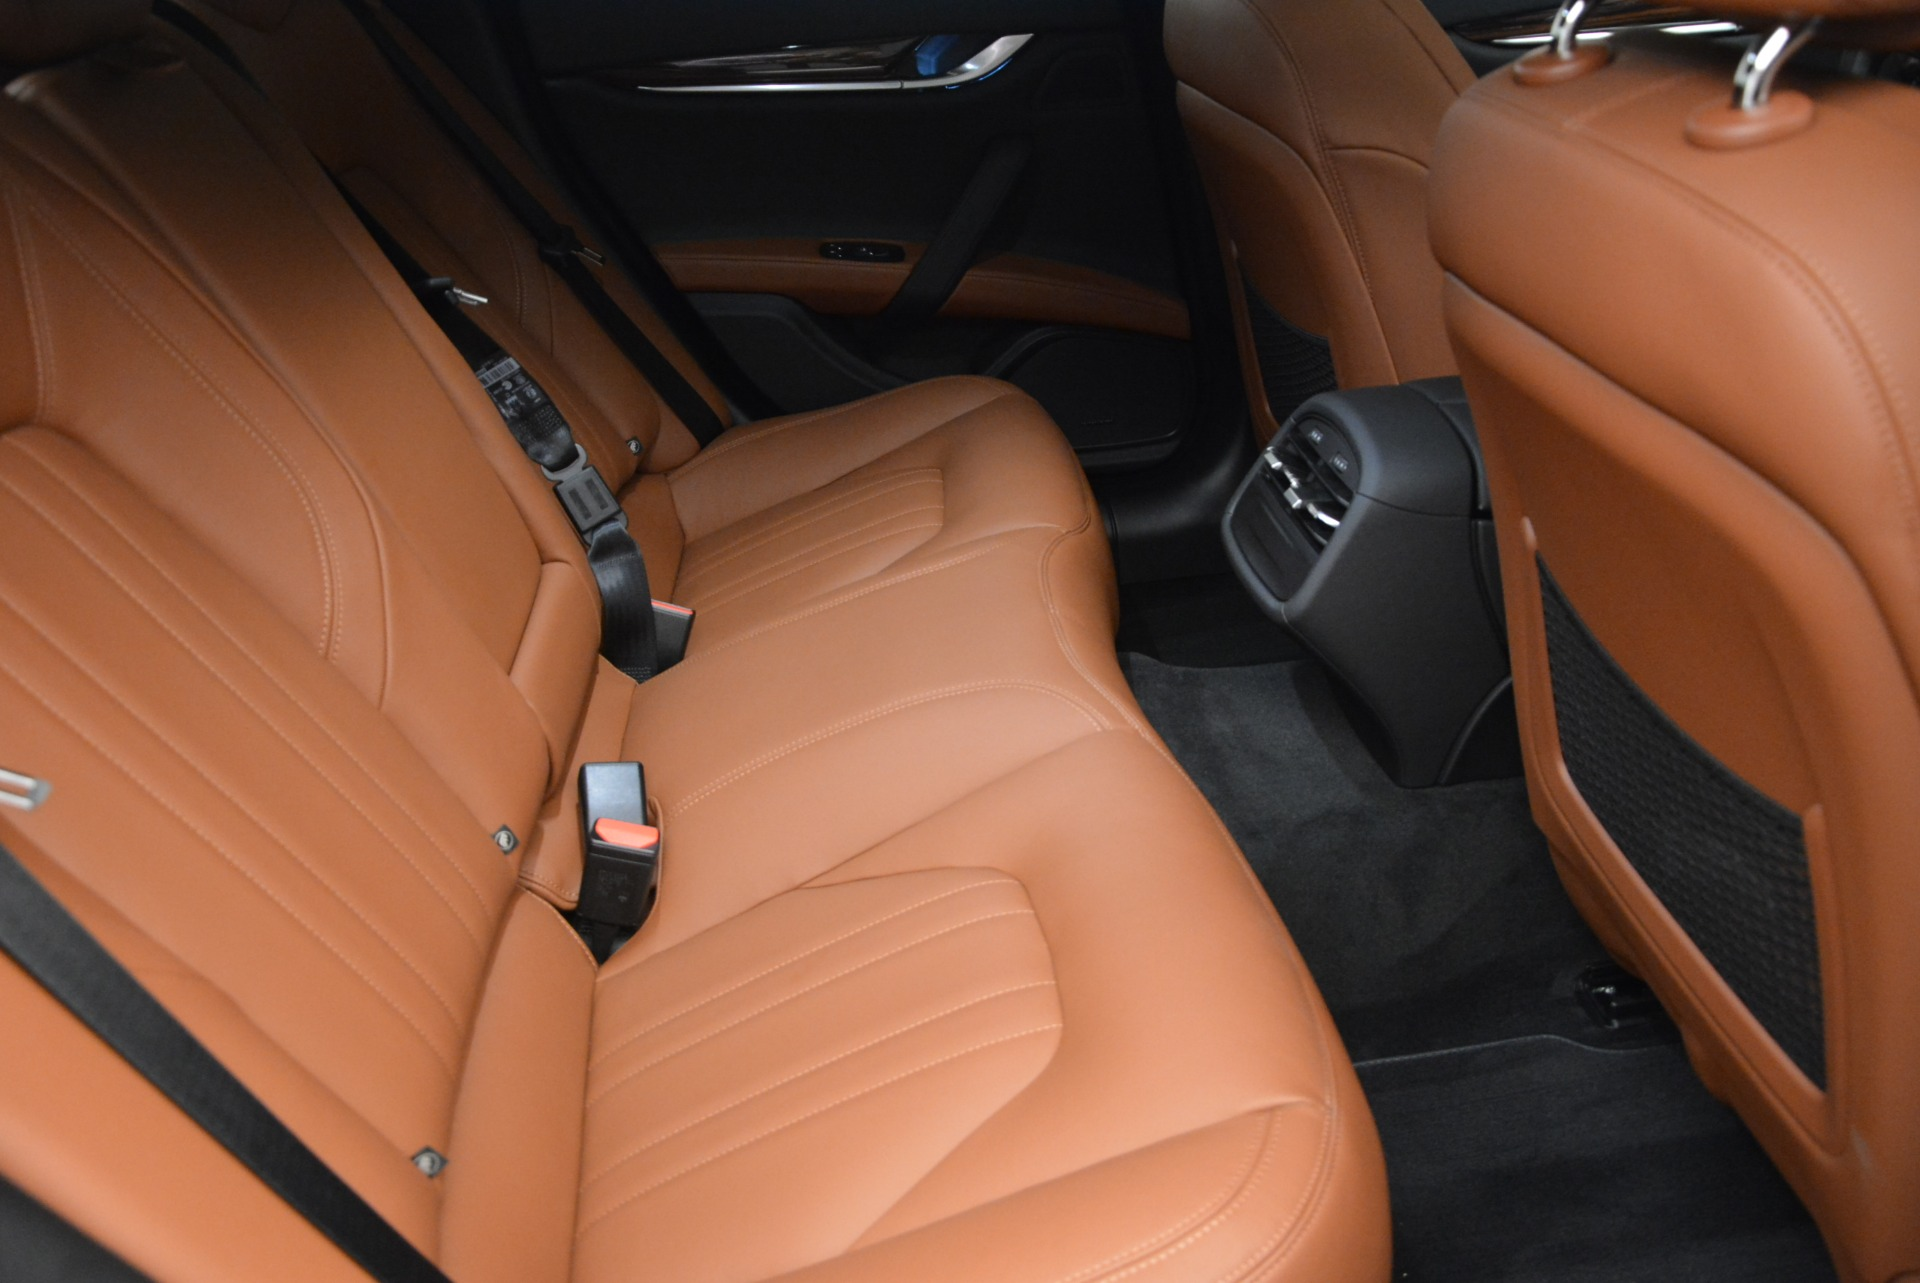 Used 2017 Maserati Ghibli S Q4 Ex-Loaner For Sale In Greenwich, CT 719_p24